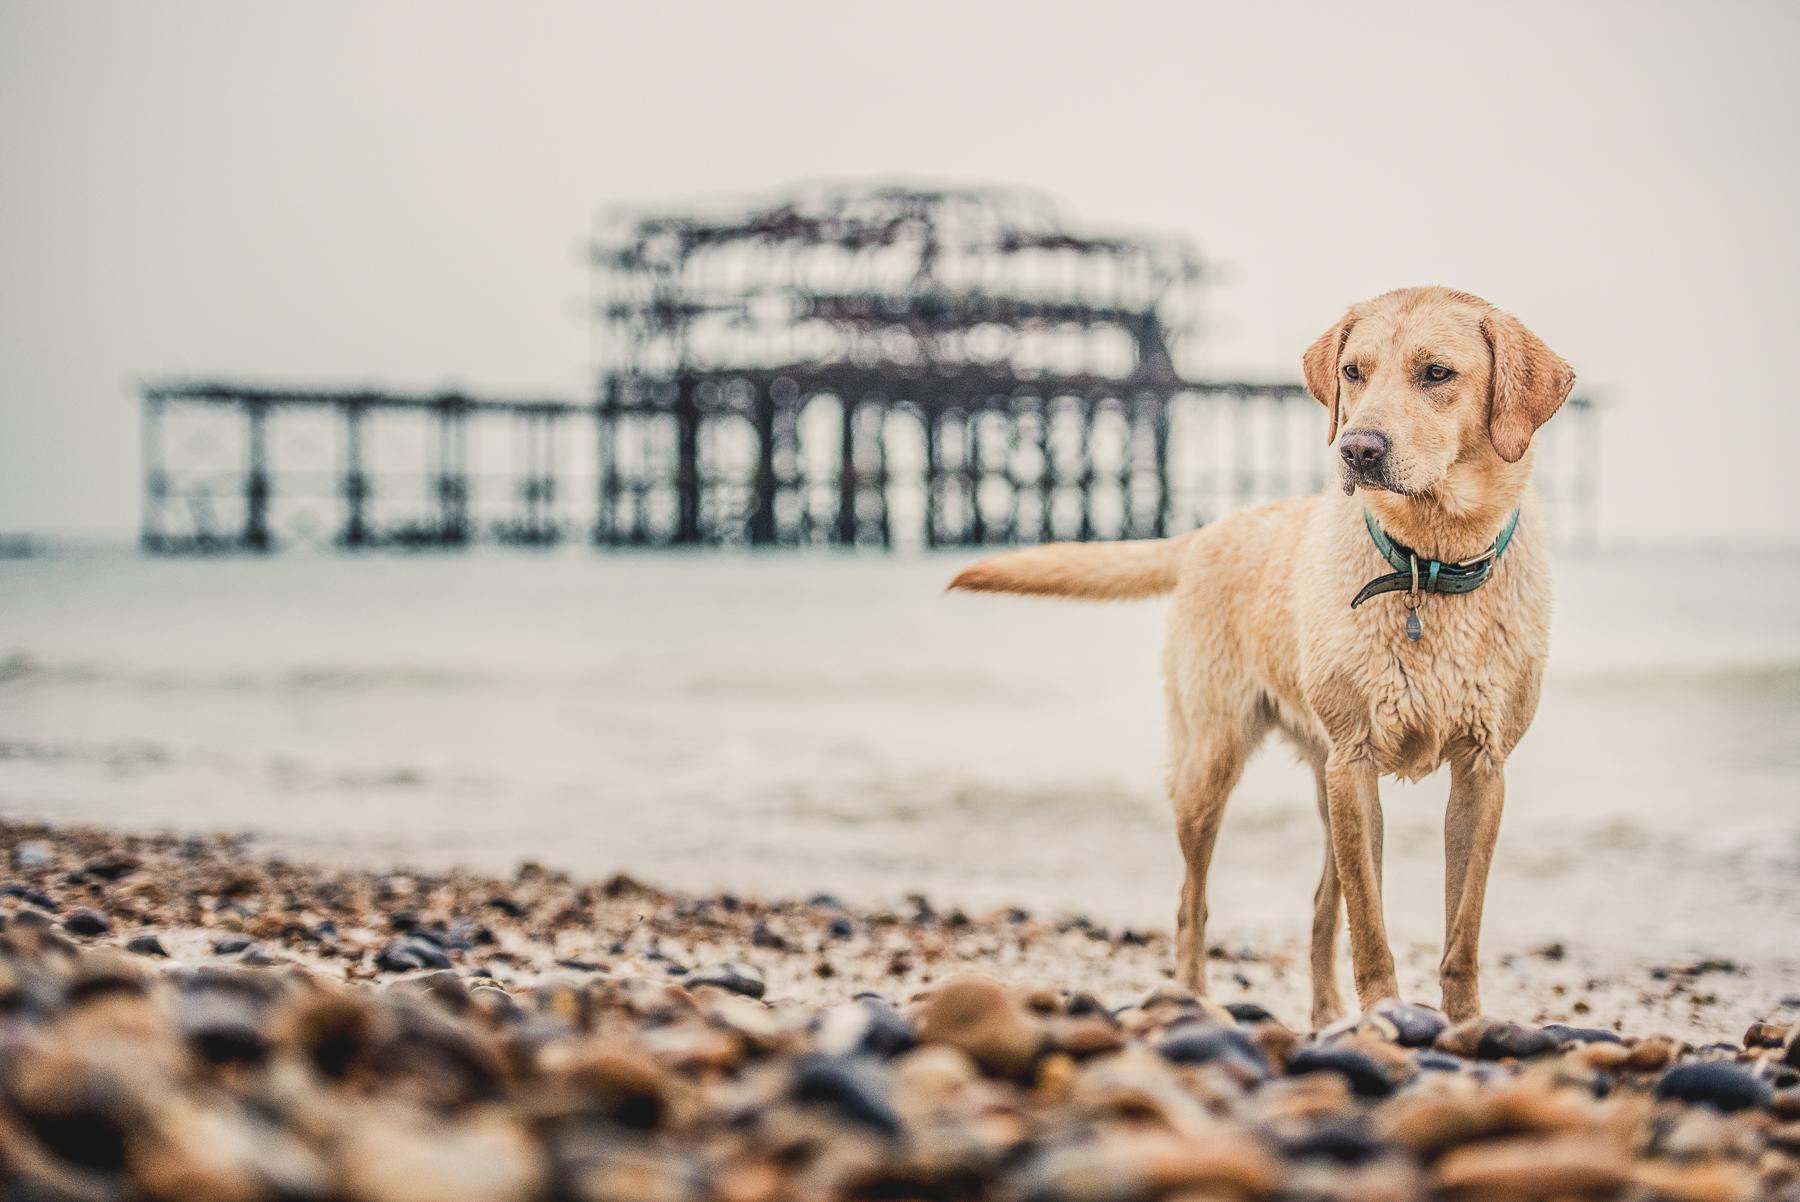 Dog standing next to old brighton pier